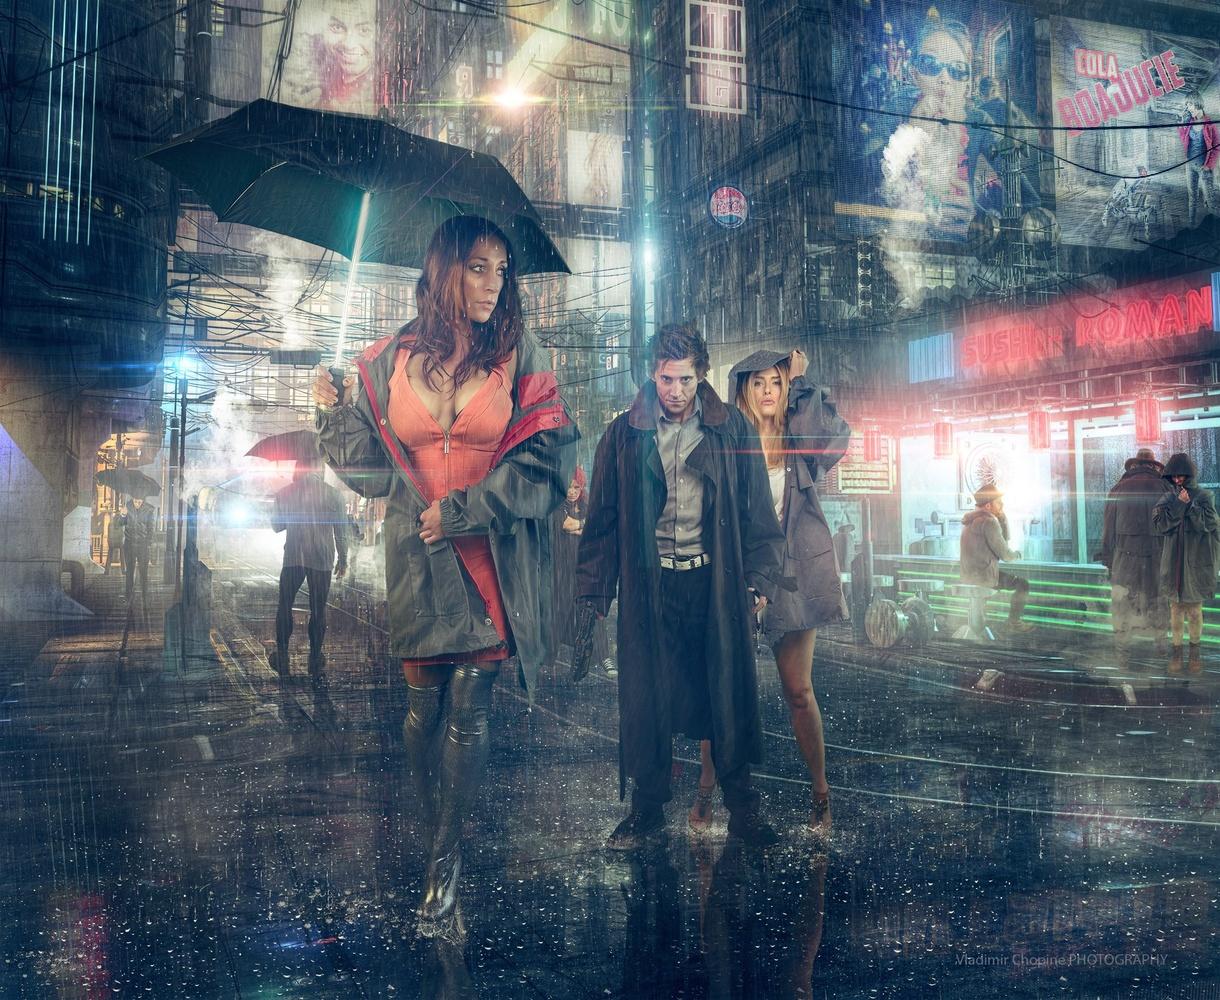 Cyberpunk city by Vladimir Chopine